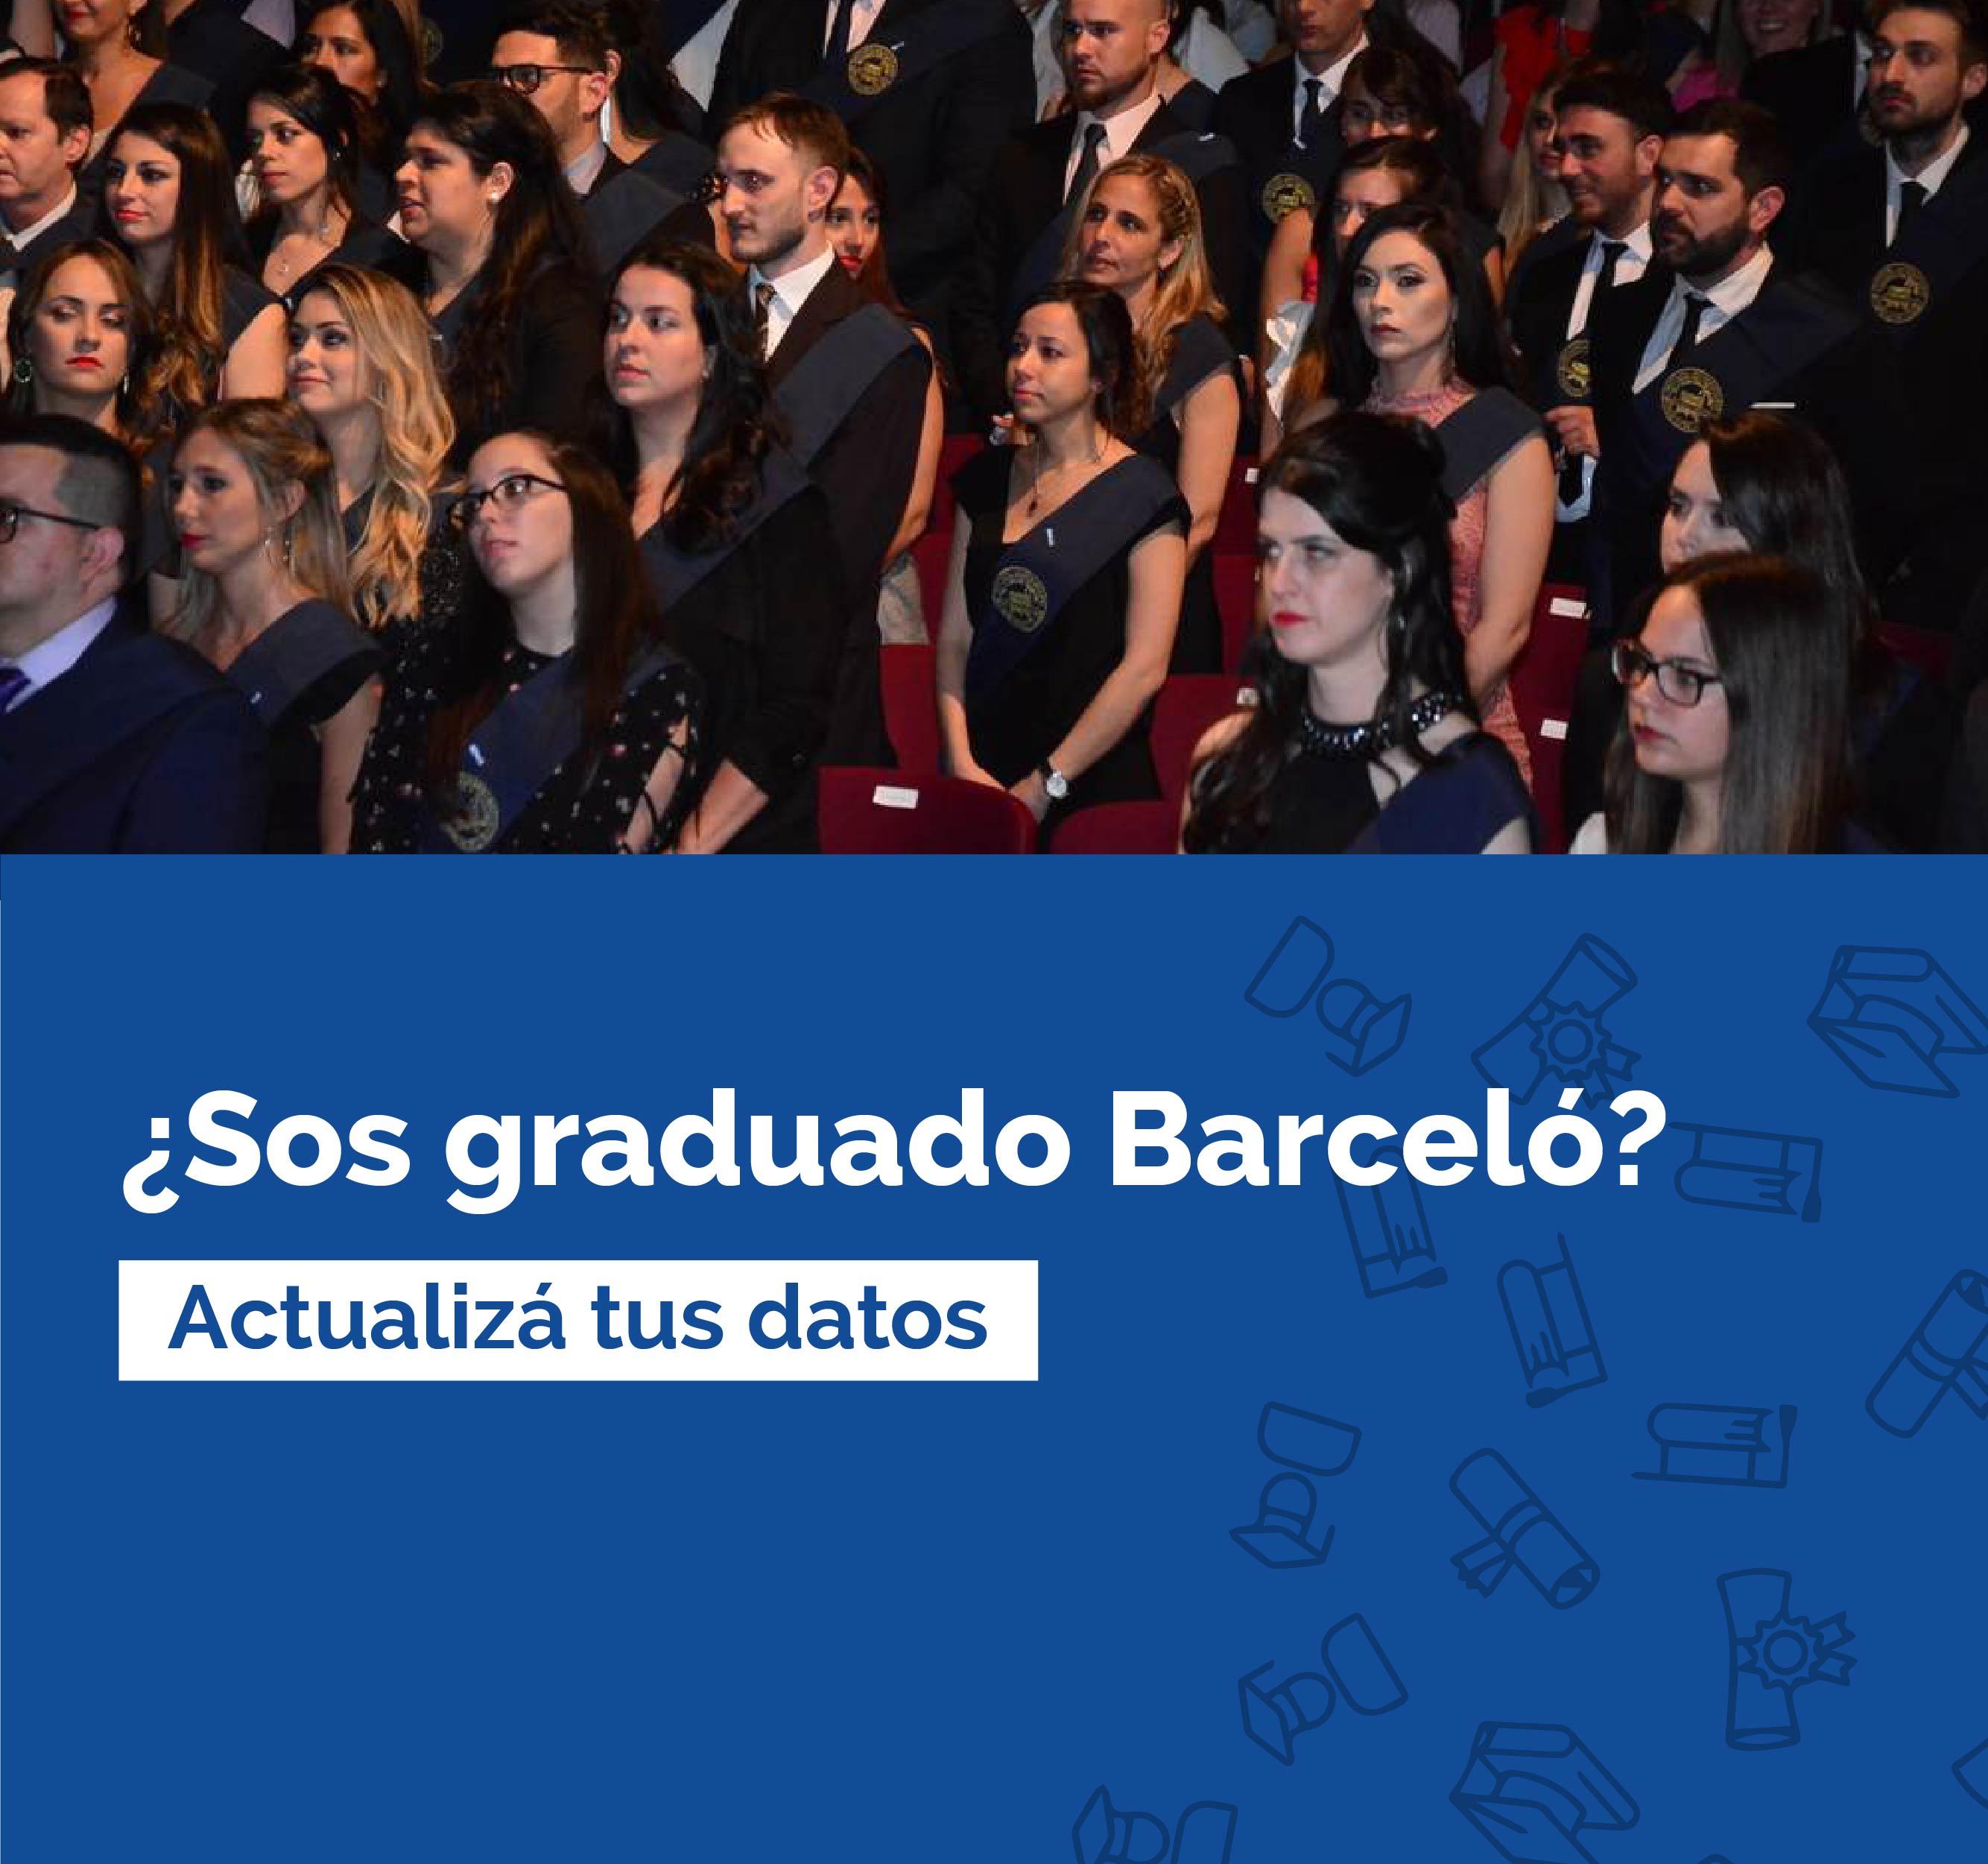 ¿Sos graduado Barceló?